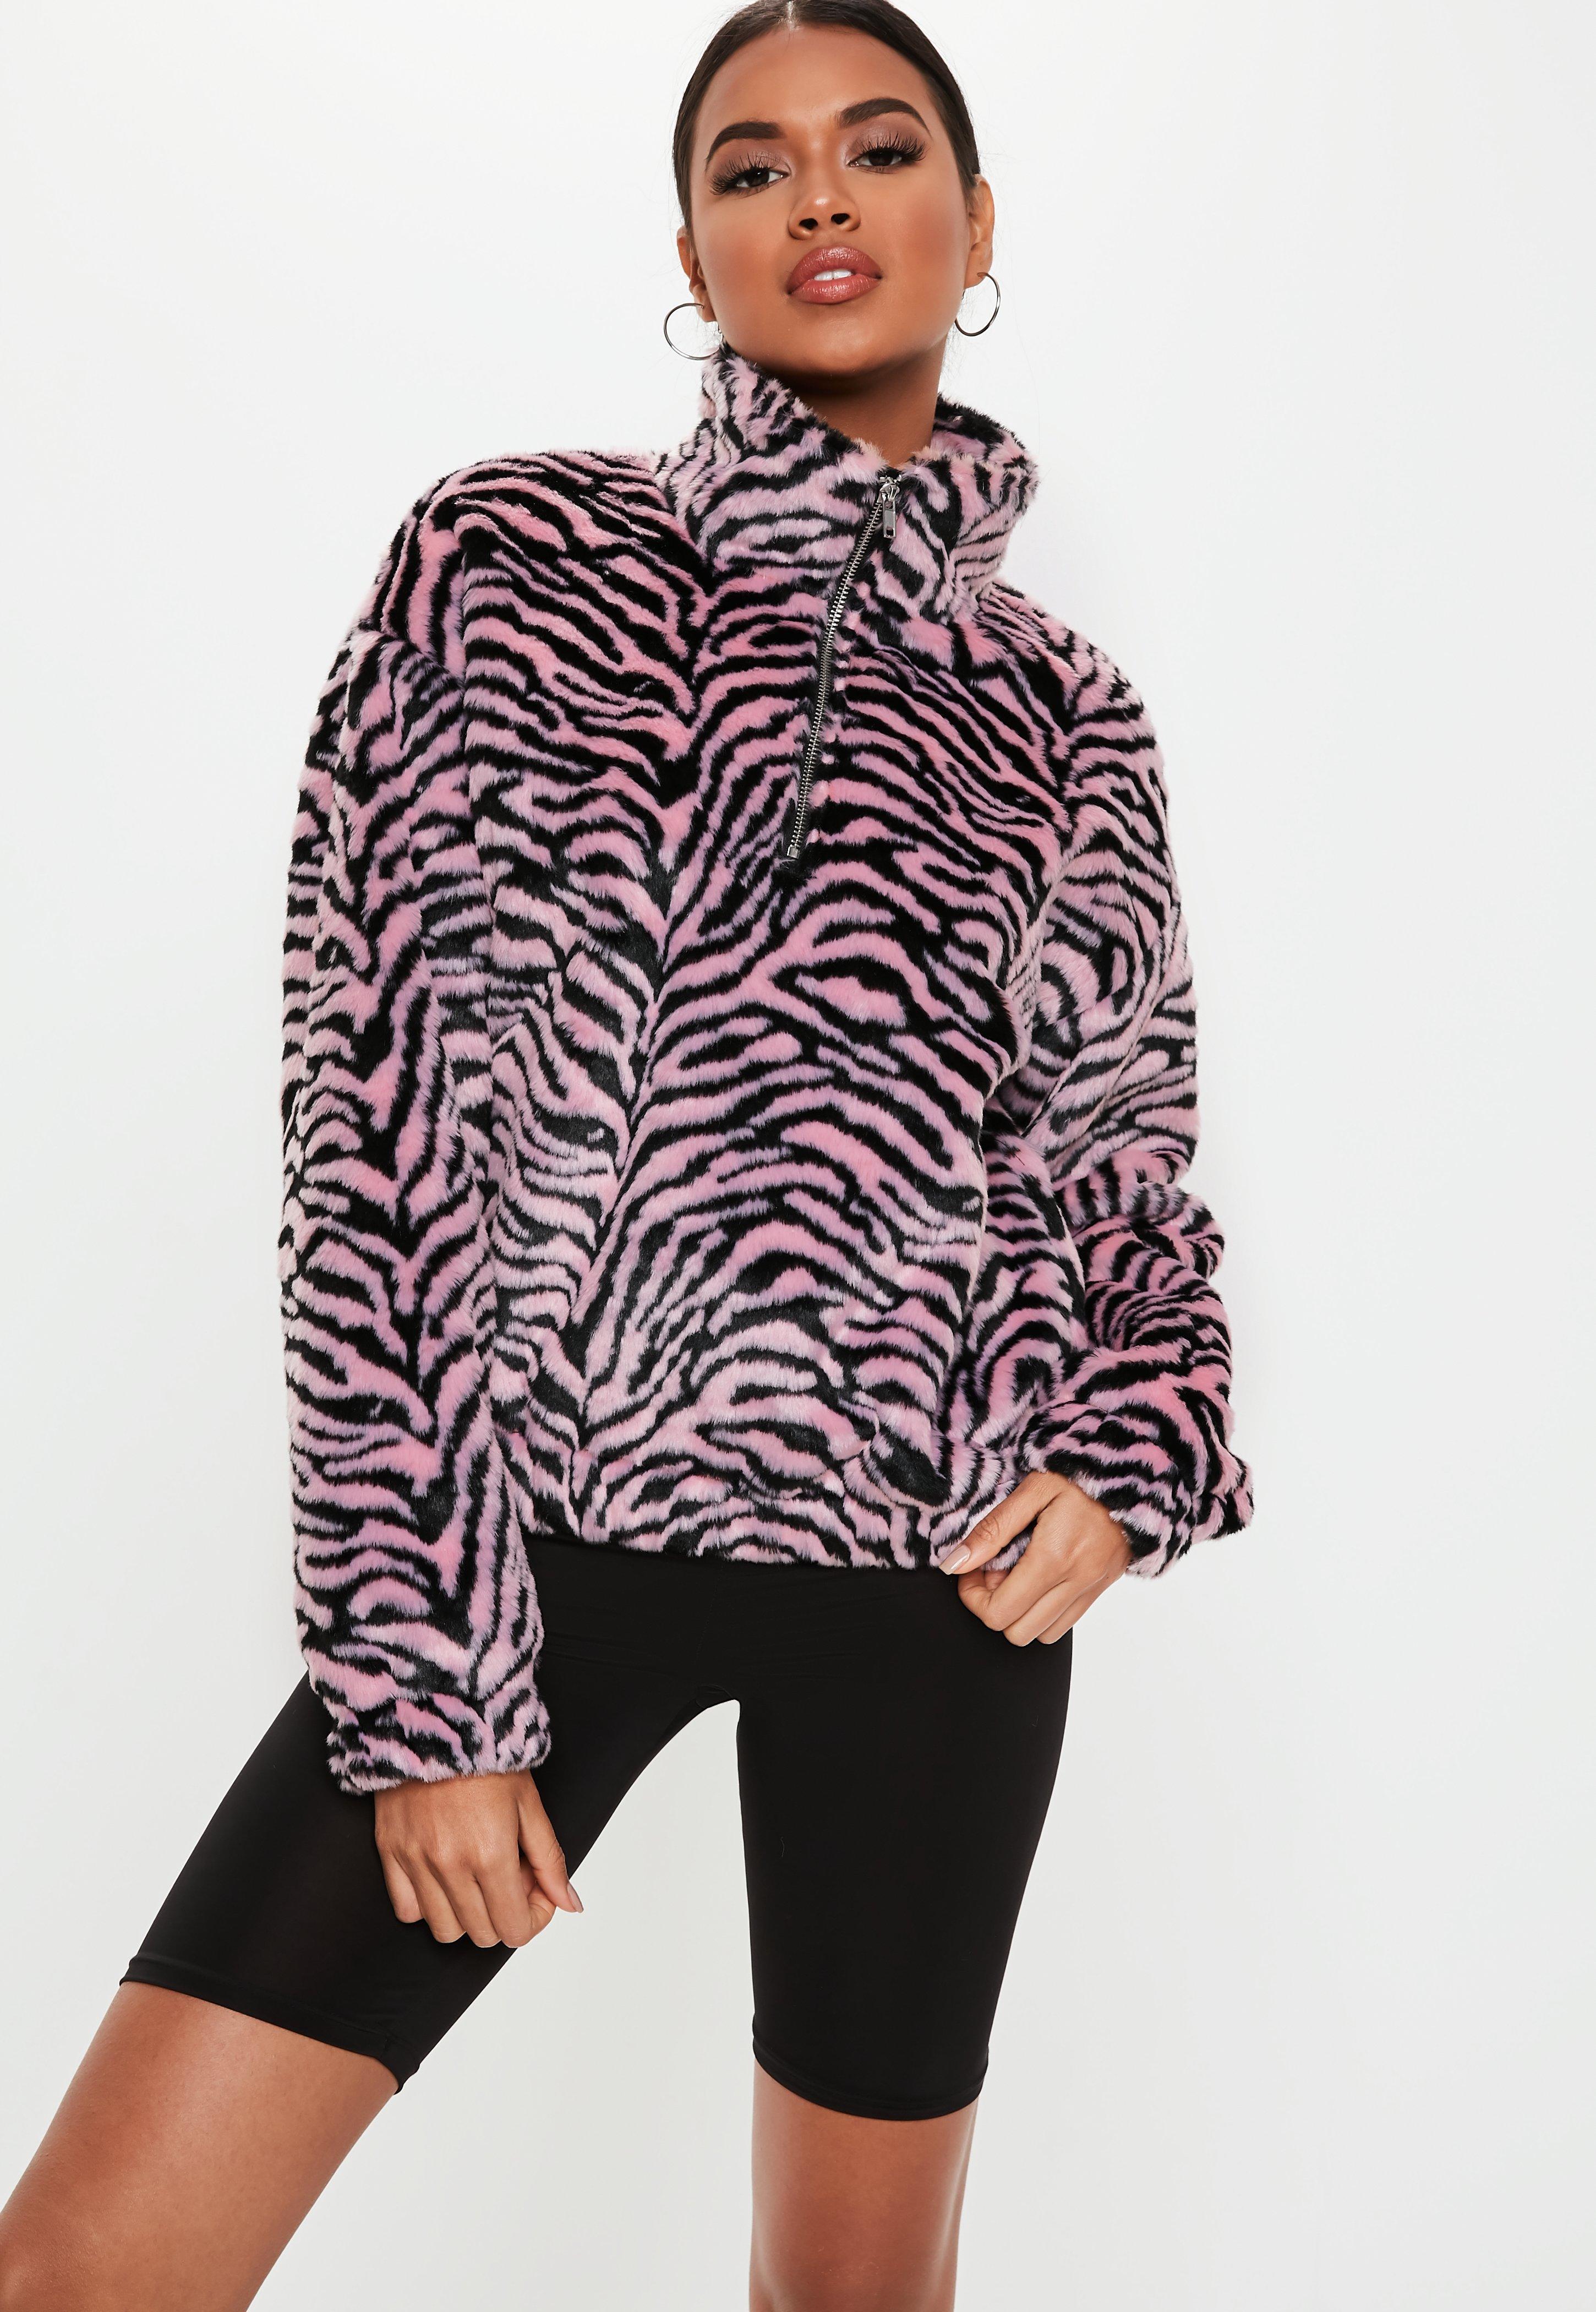 d226f4ba5fc837 Women s Coats   Jackets Online